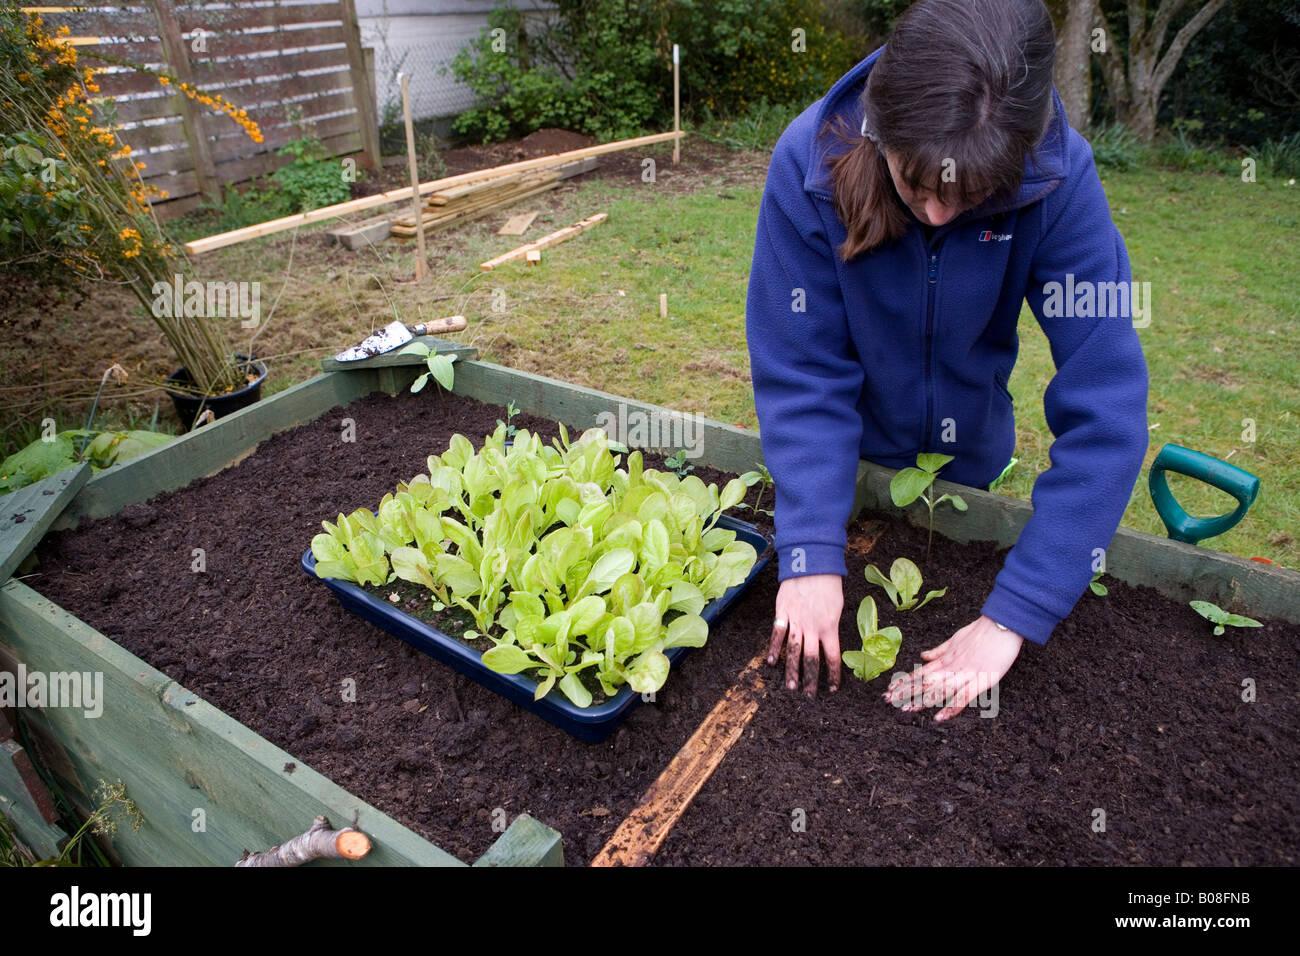 Woman gardener planting vegetables in her garden in raised beds, Inverness, Scotland - Stock Image